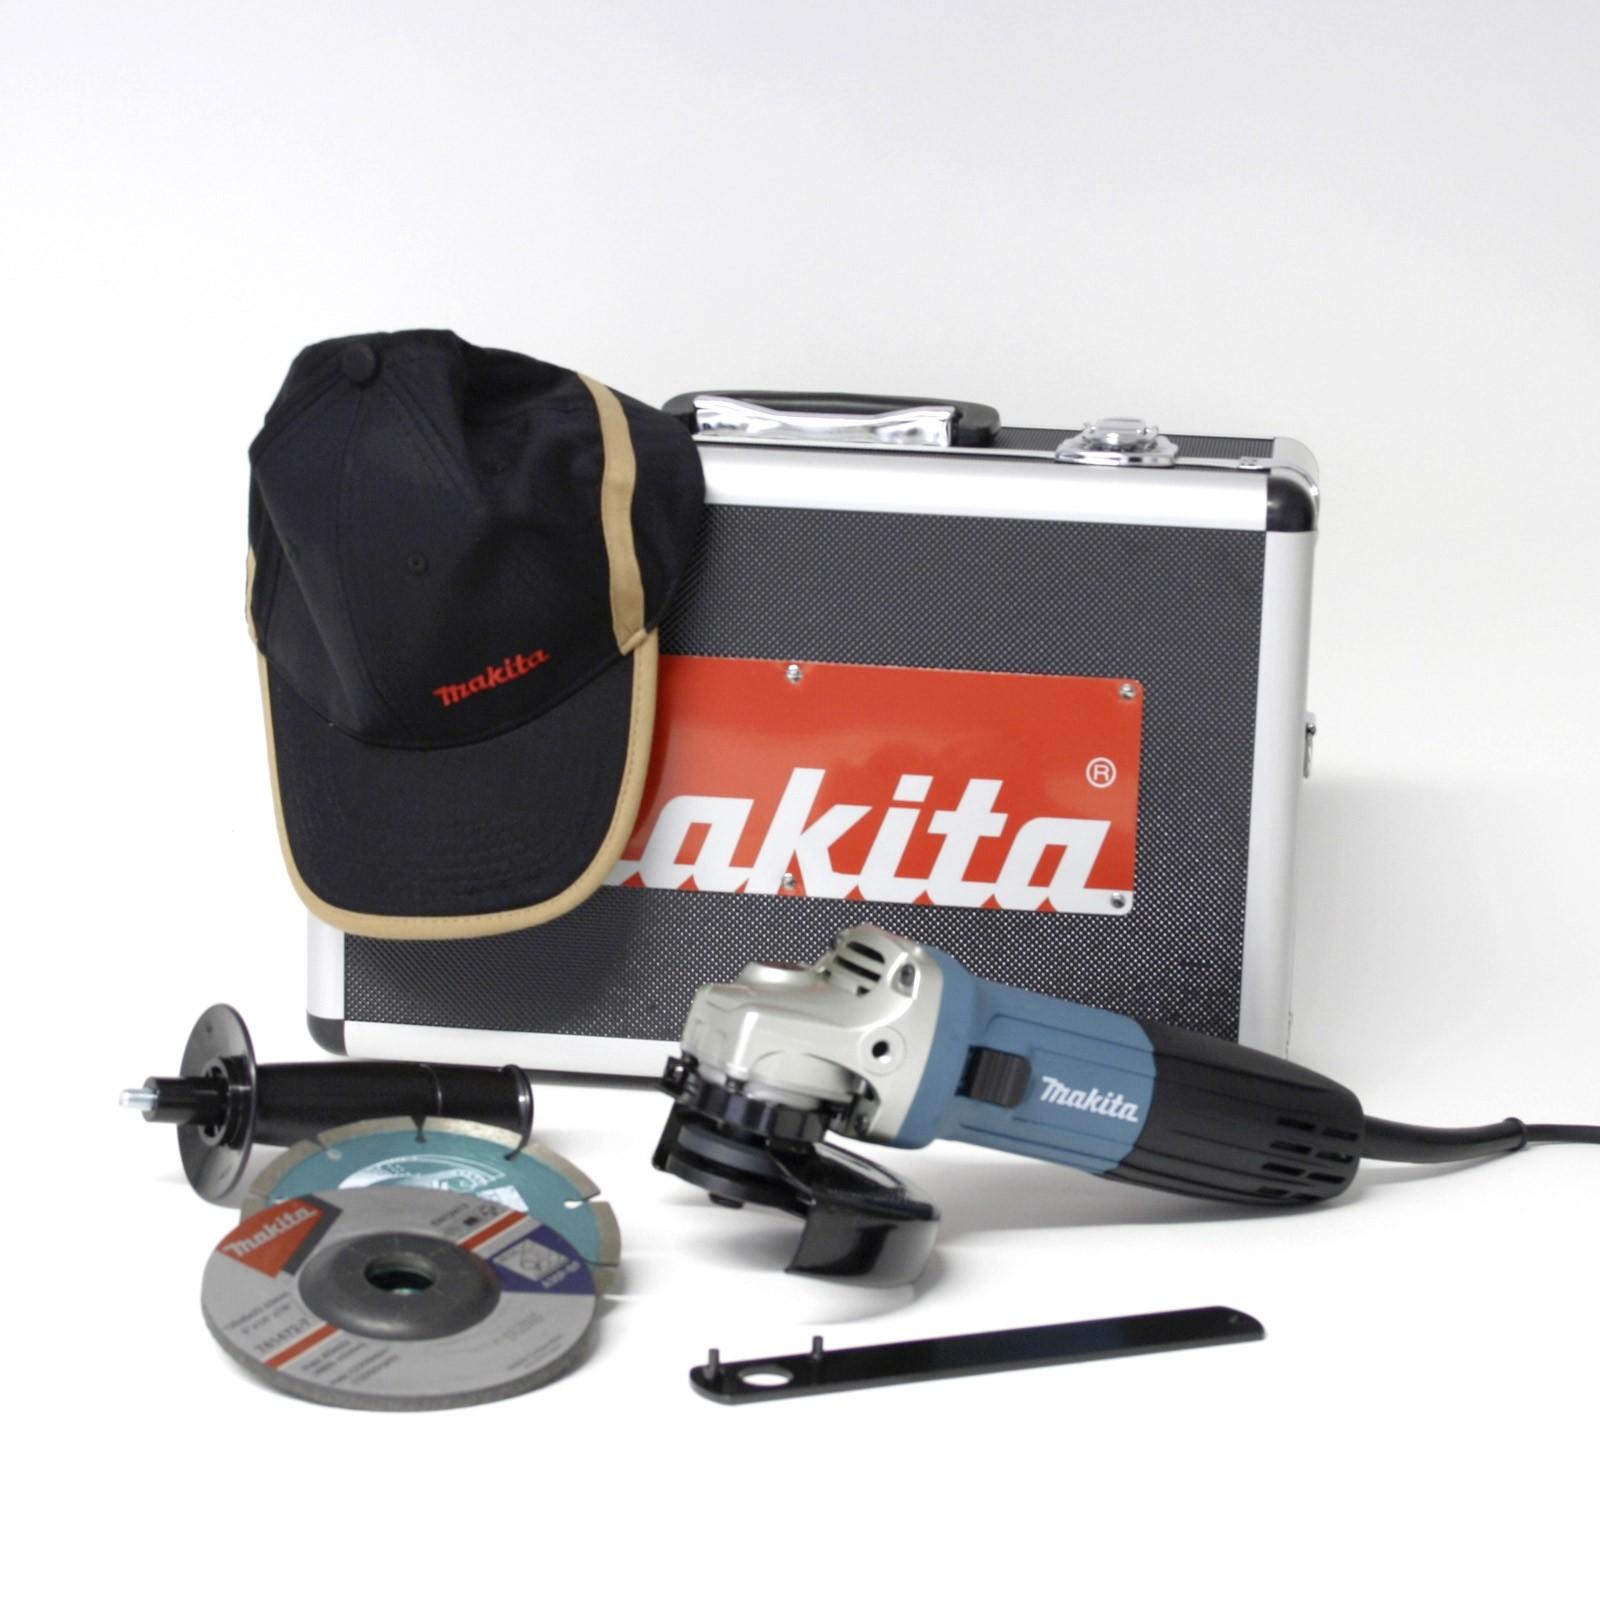 Makita Winkelschleifer Trennschleifer GA5030RSP1 125mm im Koffer 720W 16036